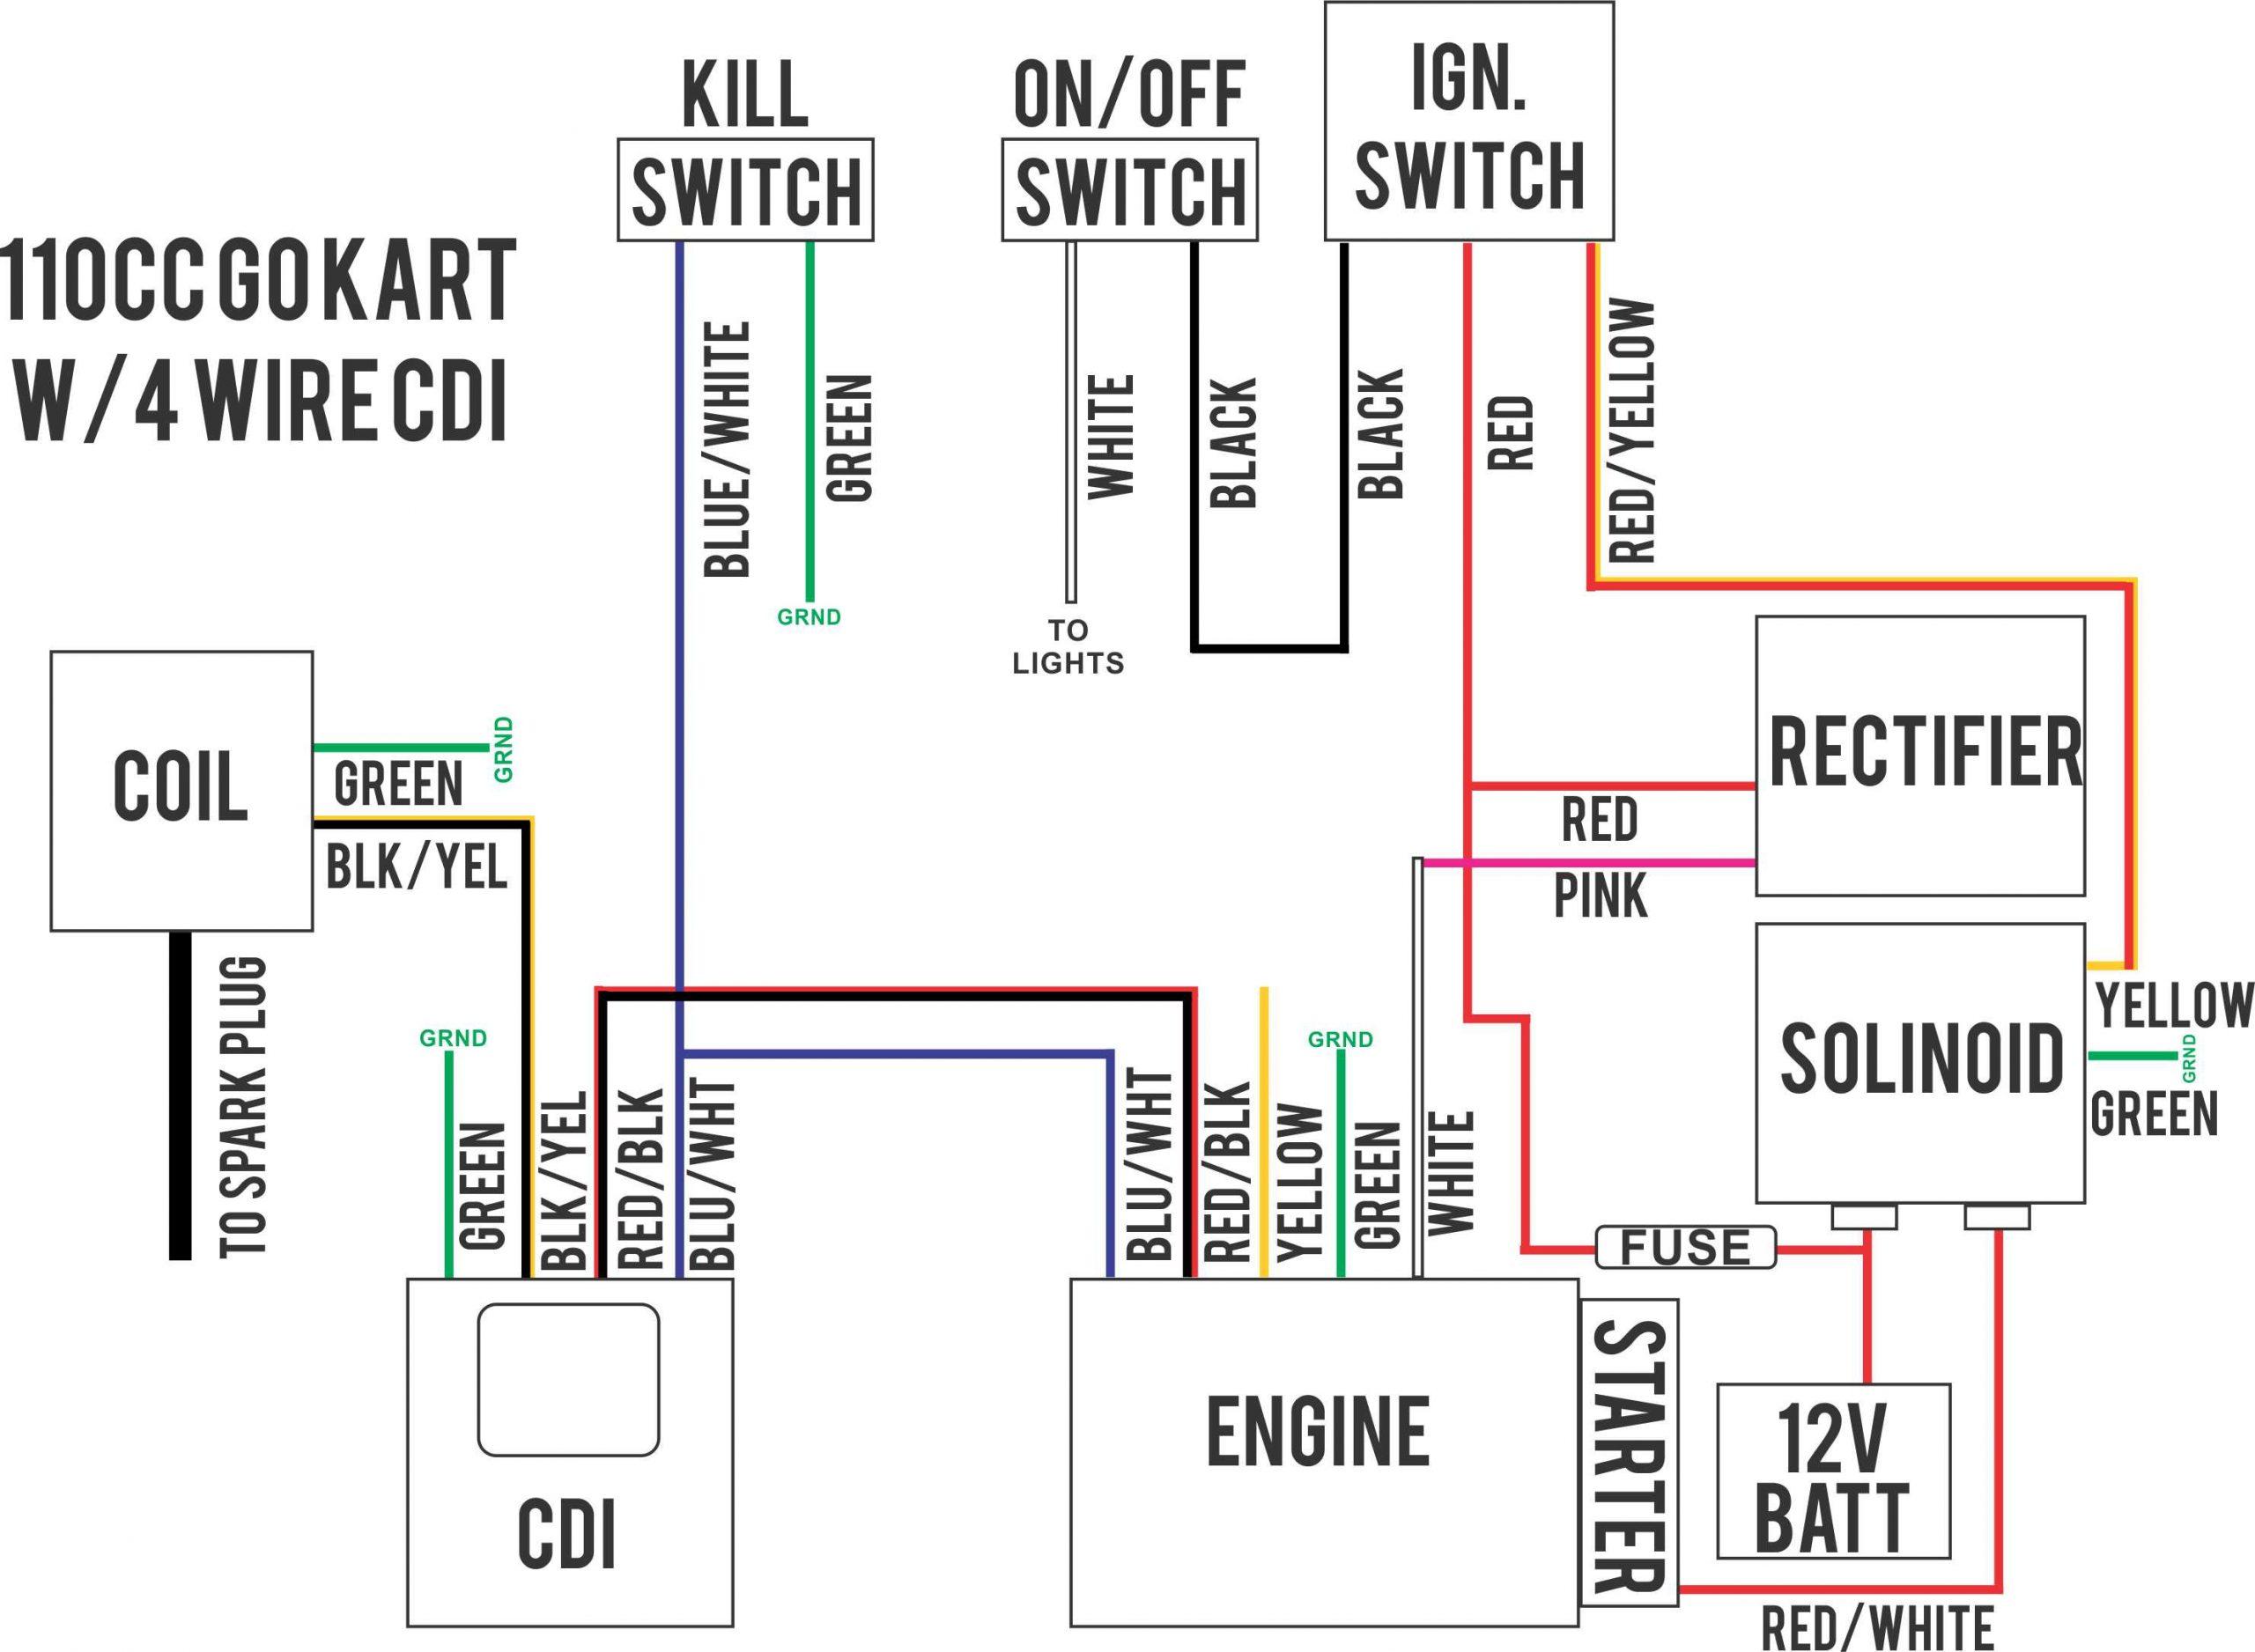 Wiring Diagrams 4 Stroke Motor Diagram] Dirt Bike for 4 Wire Cdi Box Wiring Diagram Full Version … Of Wiring Diagrams 4 Stroke Motor